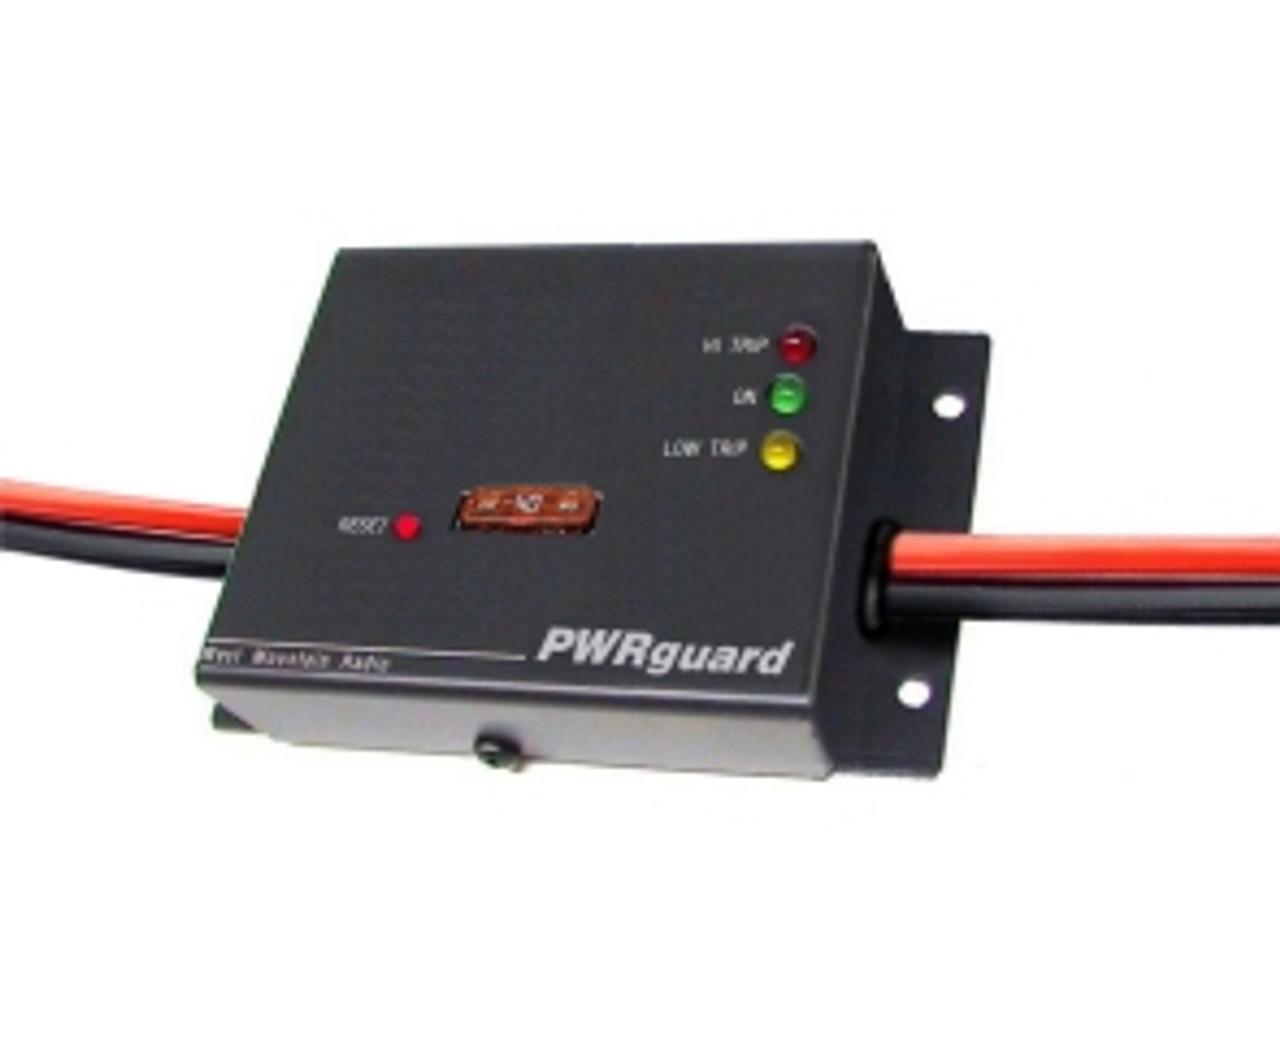 West Mountain Radio PWRguard